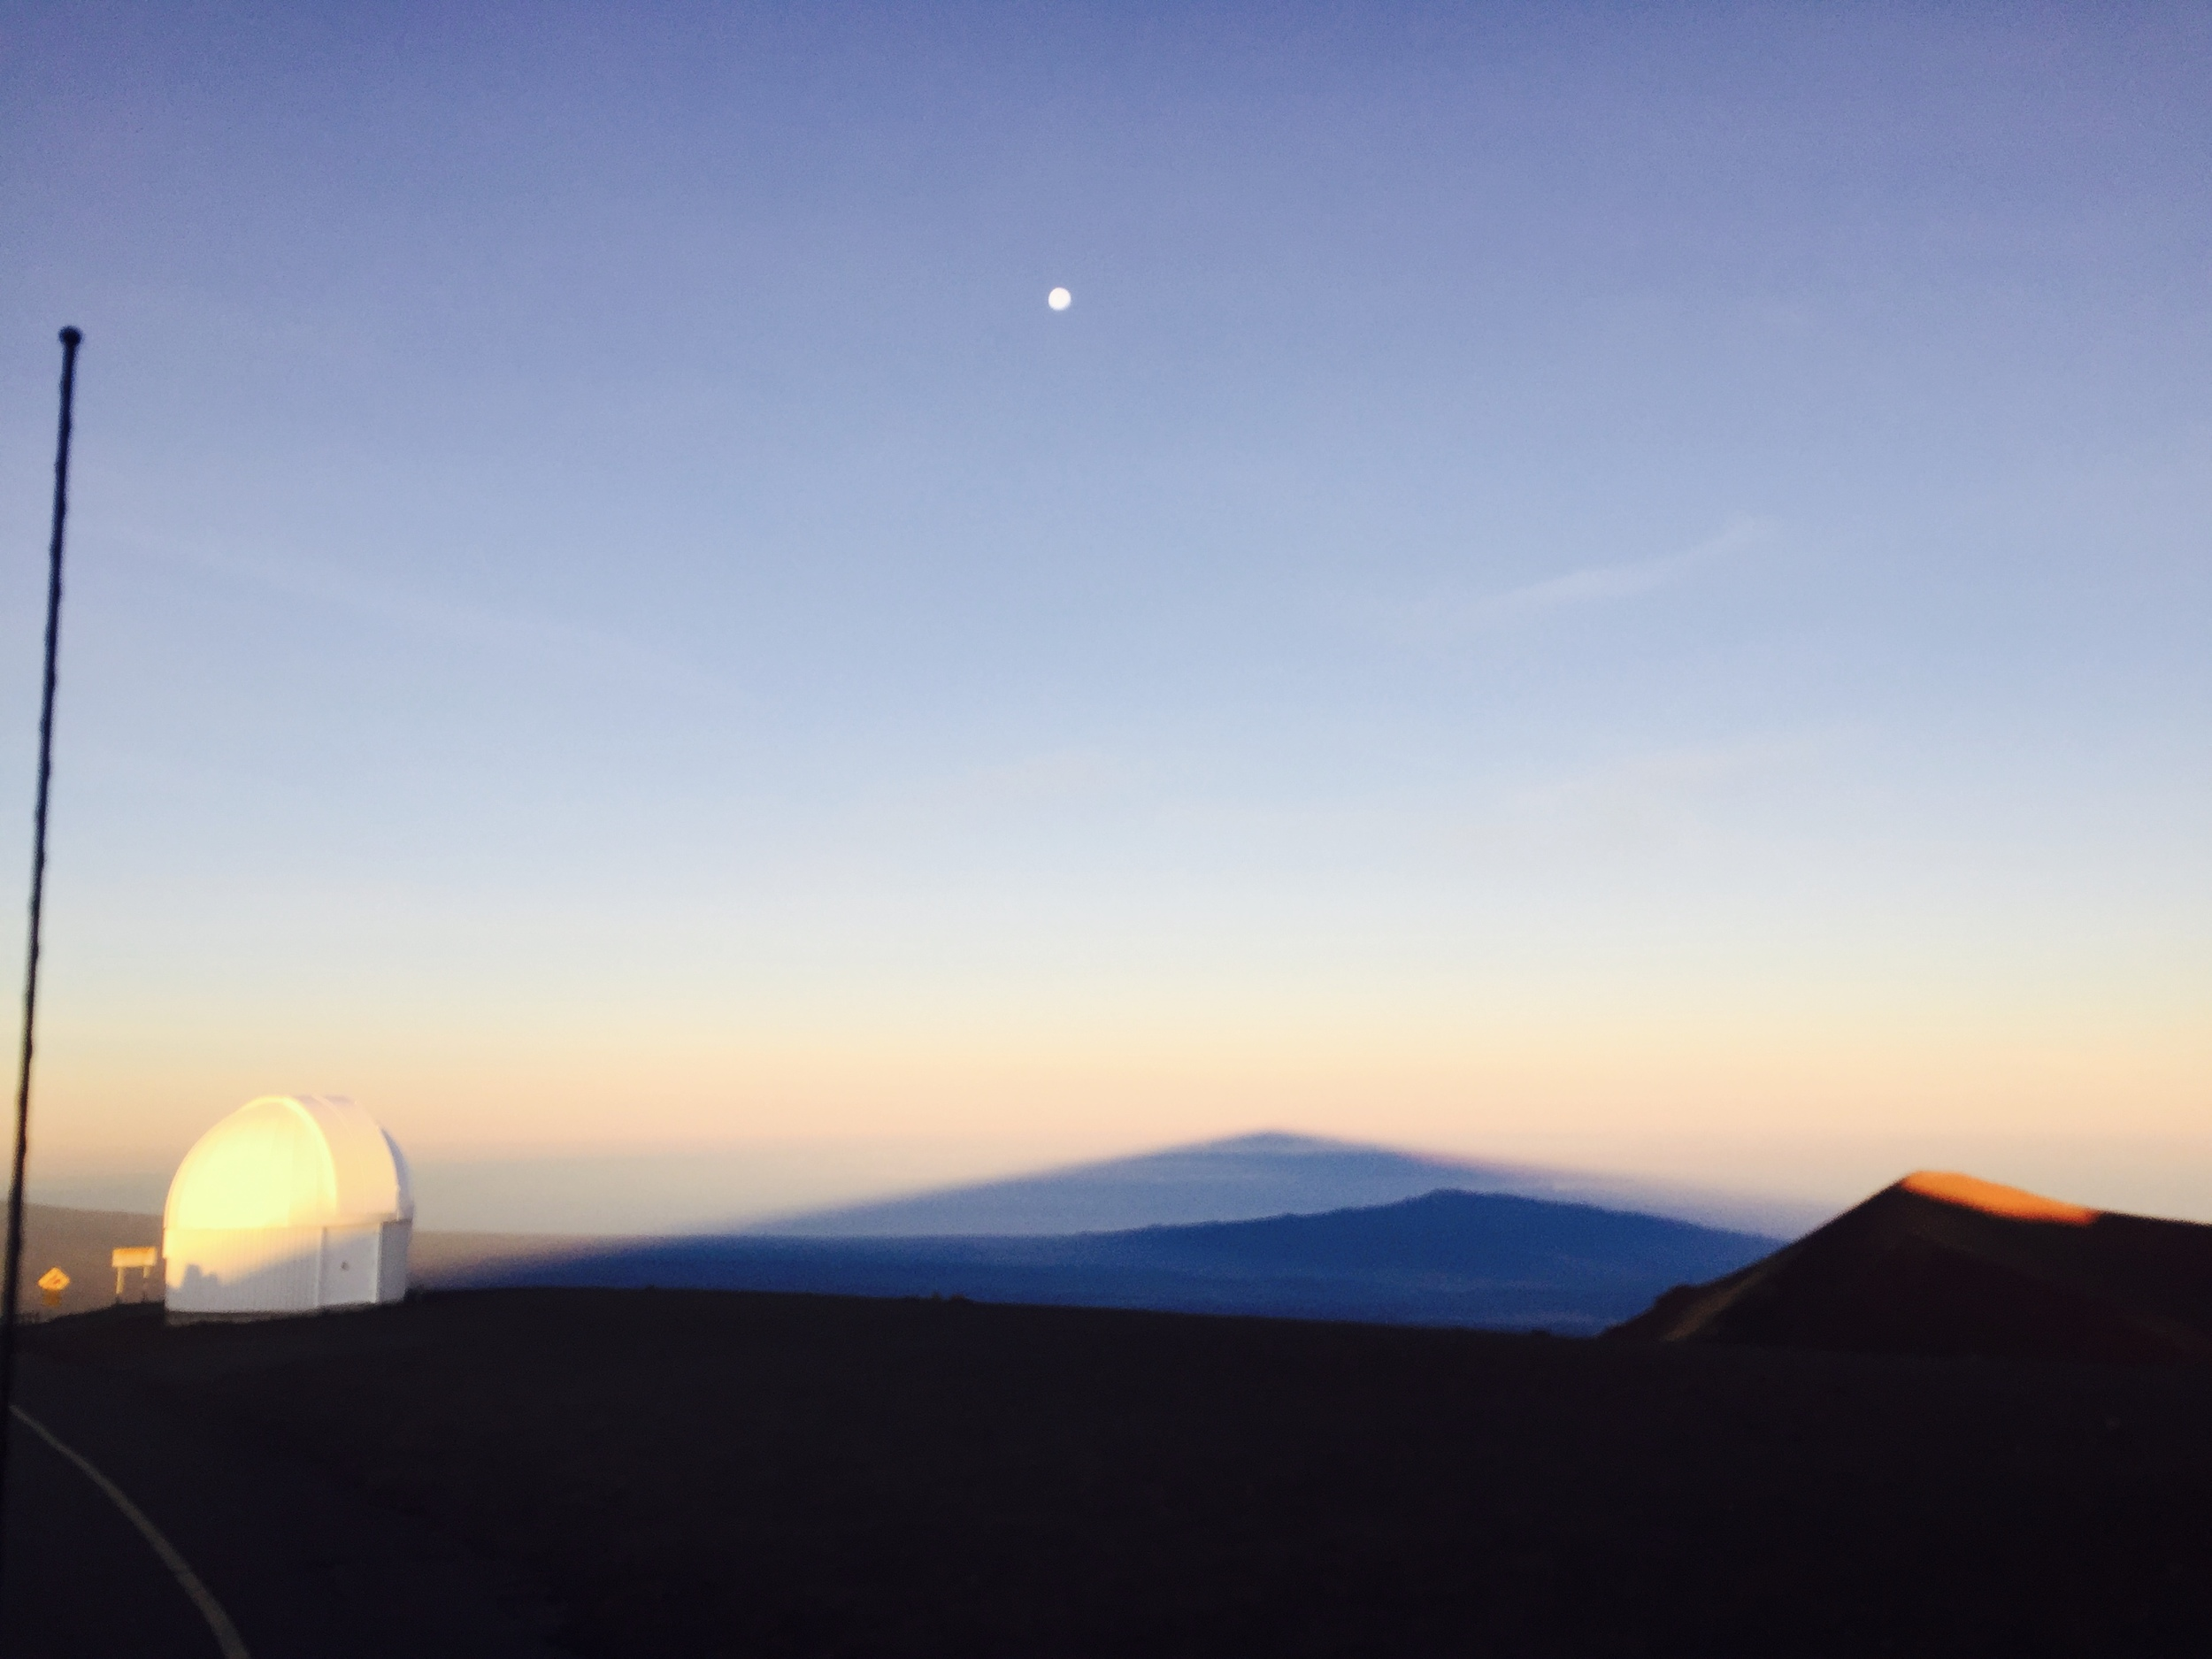 Shadow of Mauna Kea at Sunrise